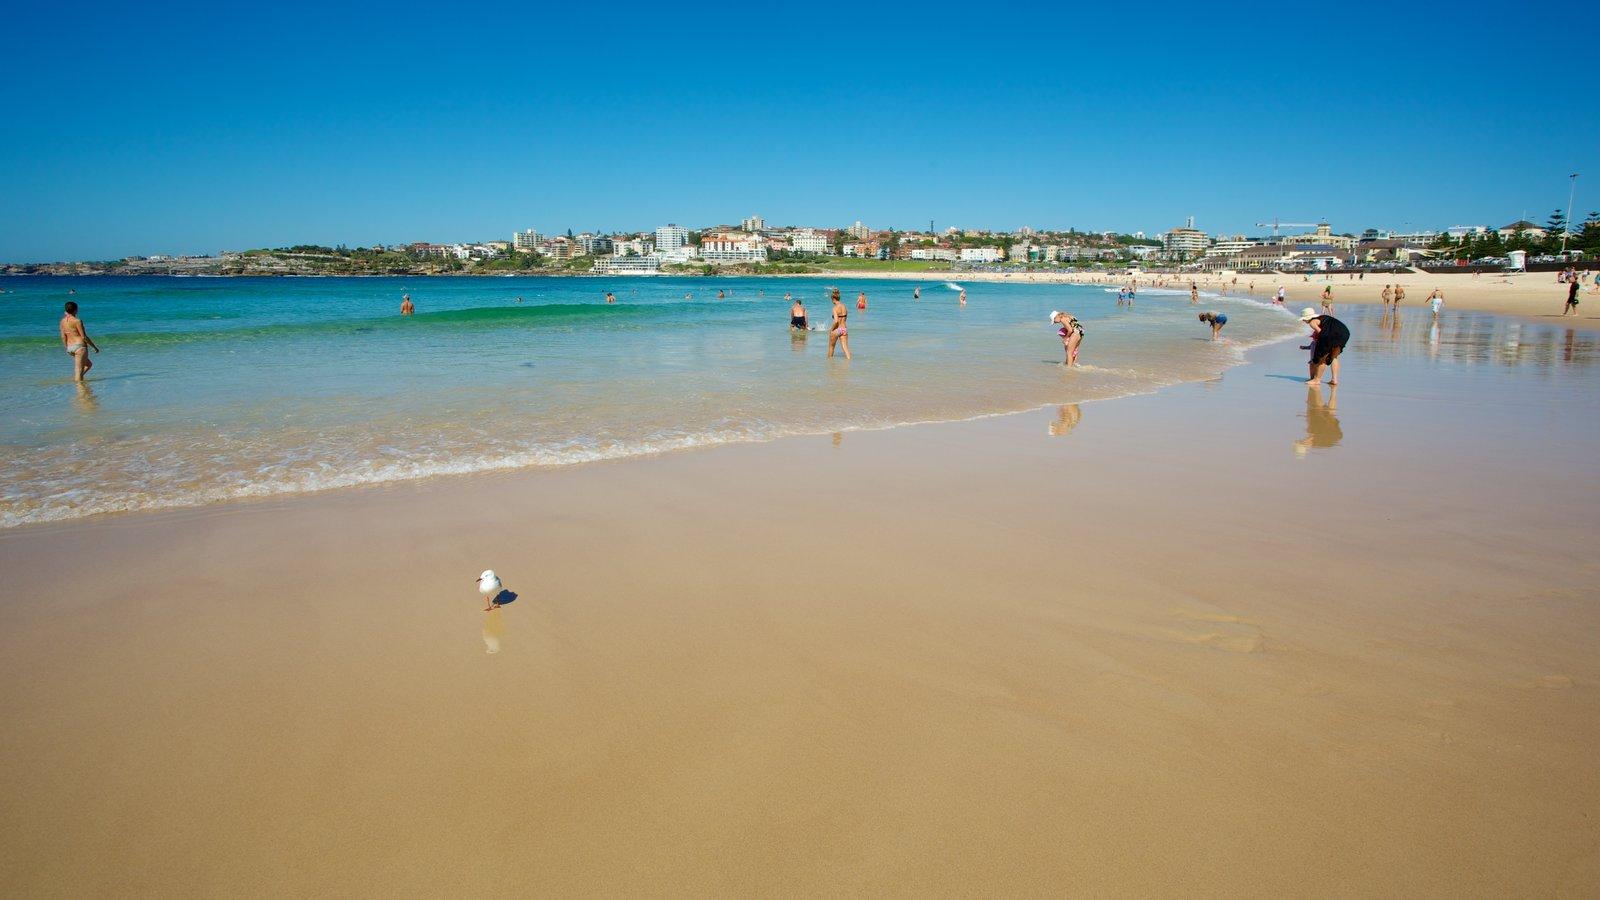 Bondi Beach which includes swimming and a sandy beach